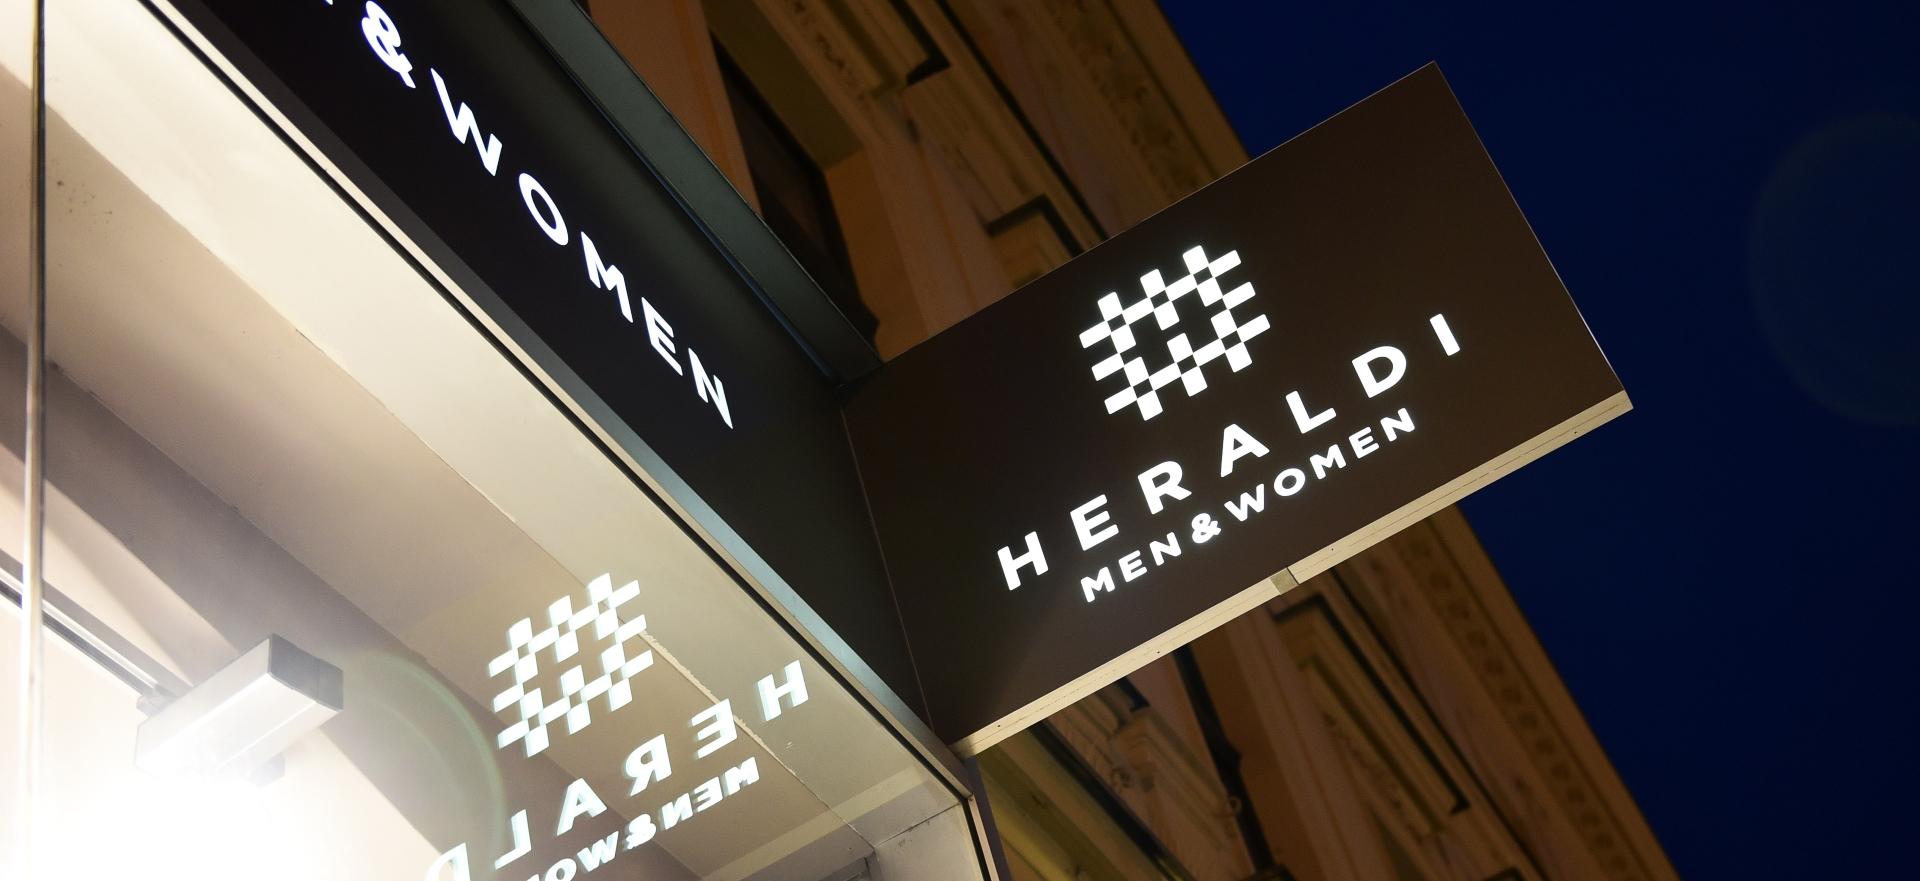 FOTO: Otvoren prvi Heraldi for women